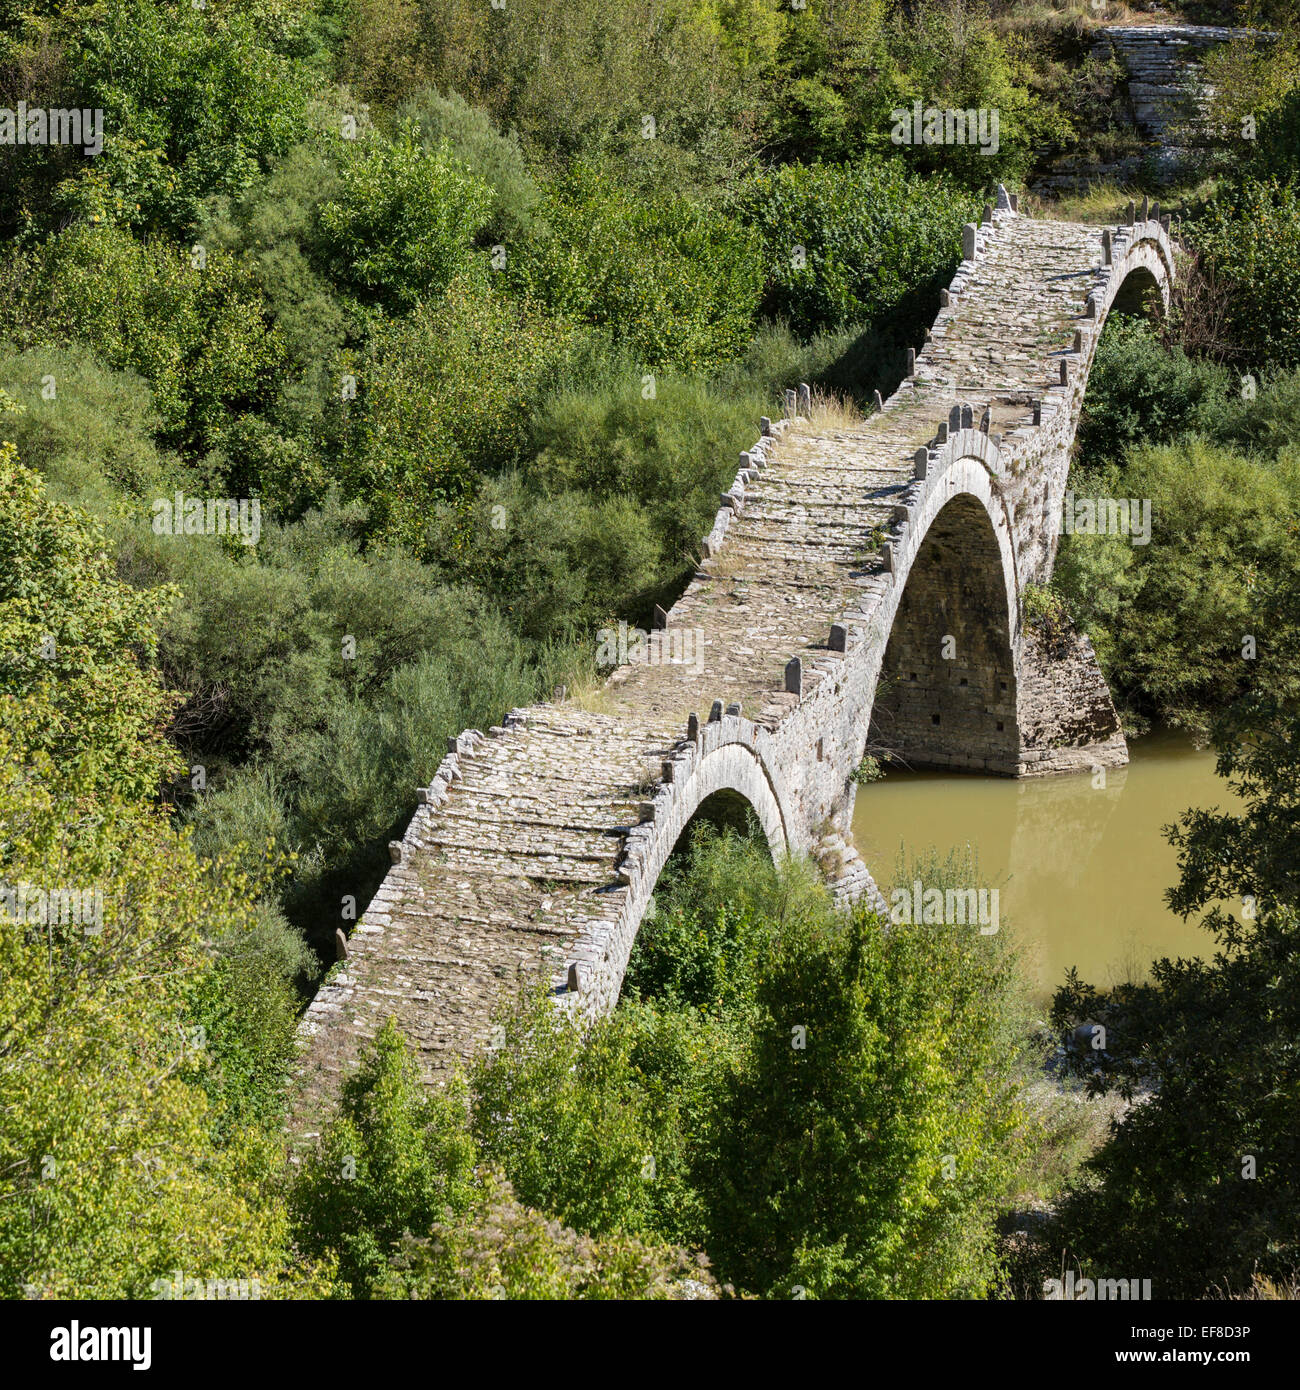 Plakida or Kalogeriko triple stone arch bridge near Kipi Greece - Stock Image